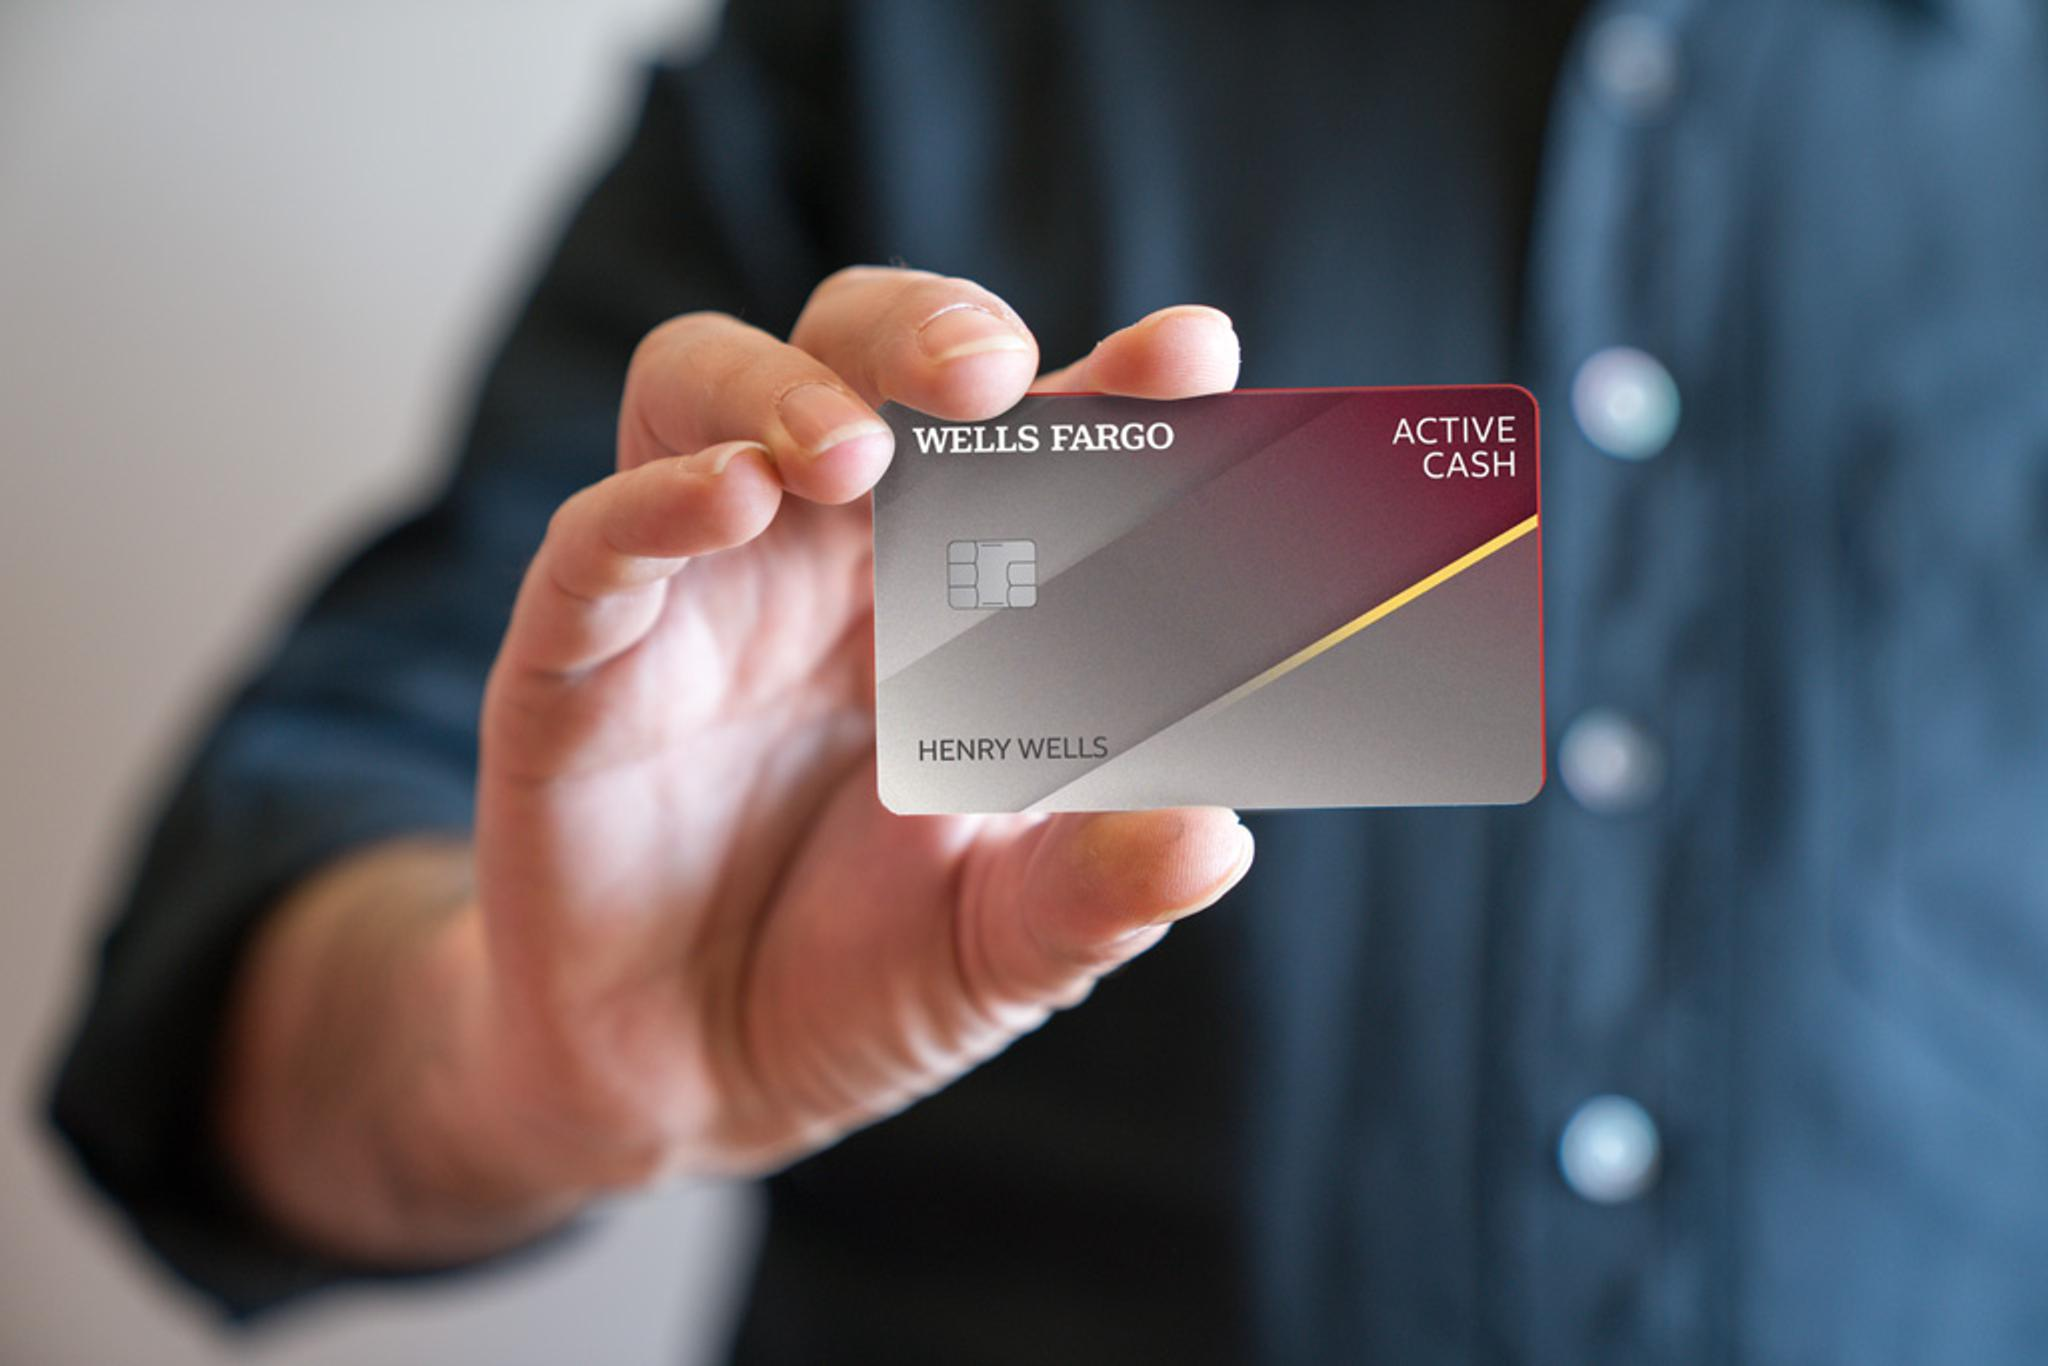 Lady holding Bank of America Customized Cash Rewards credit card